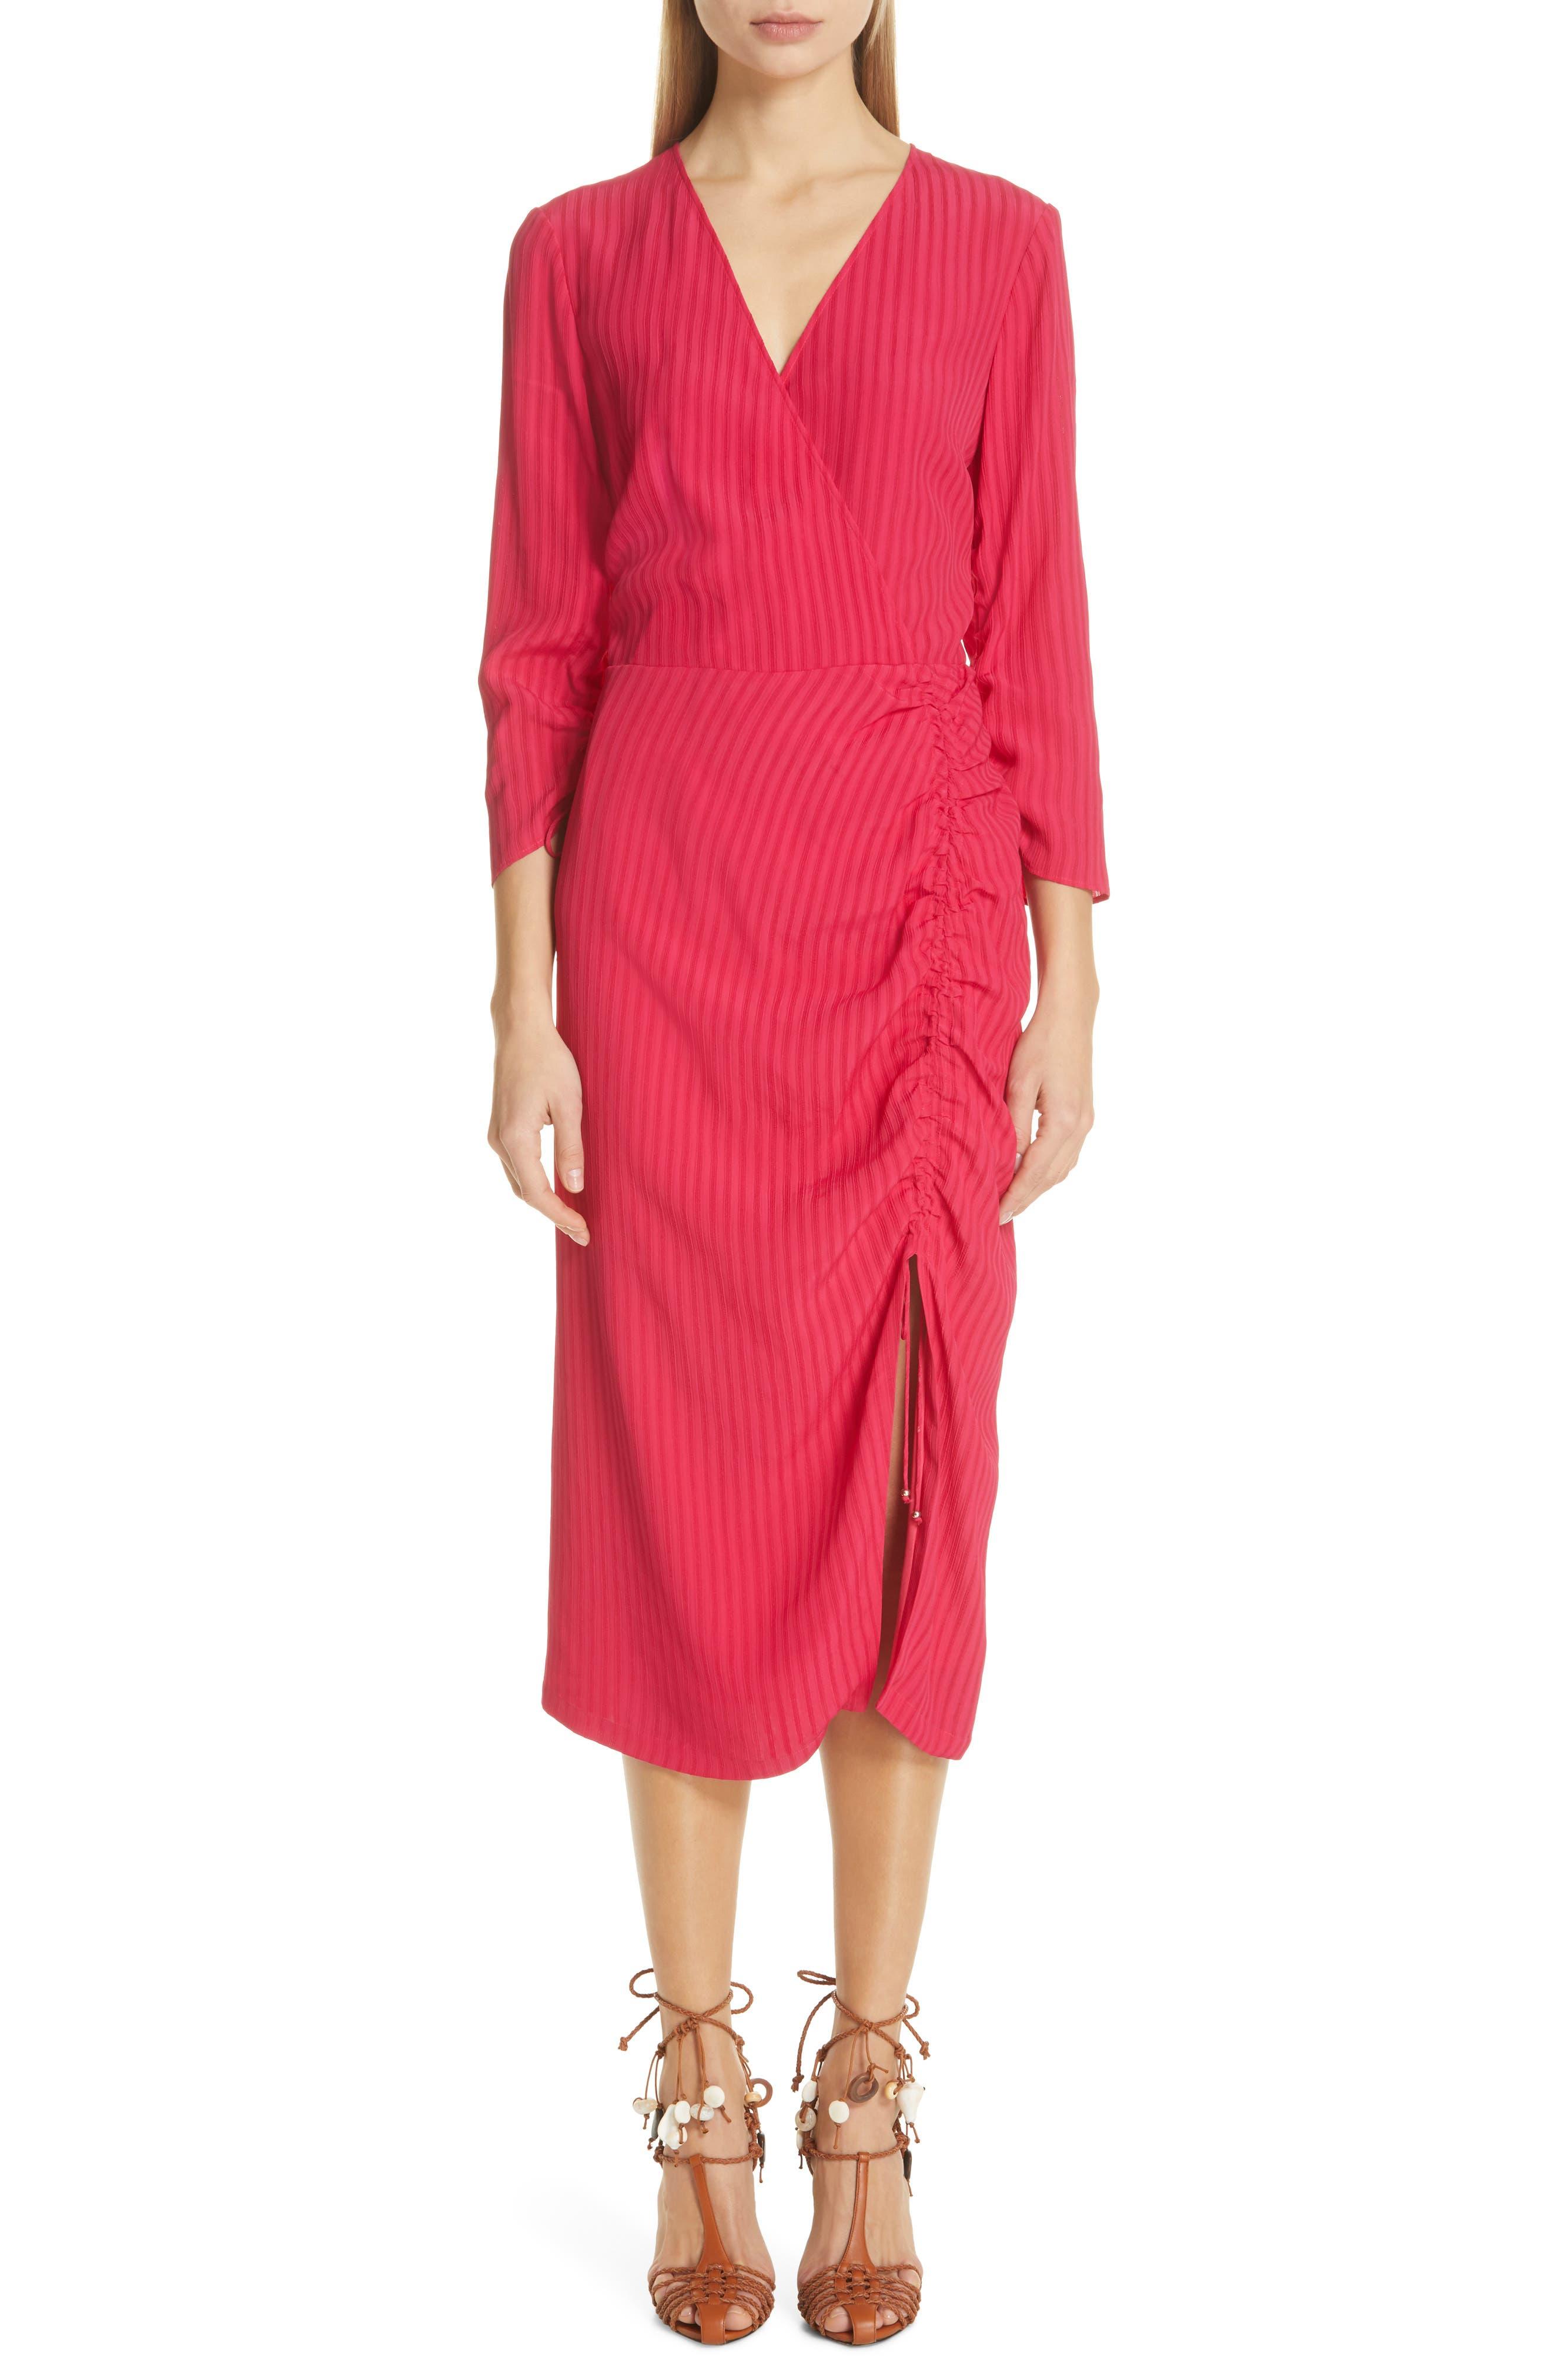 Altuzarra Stripe Ruched Dress, Pink